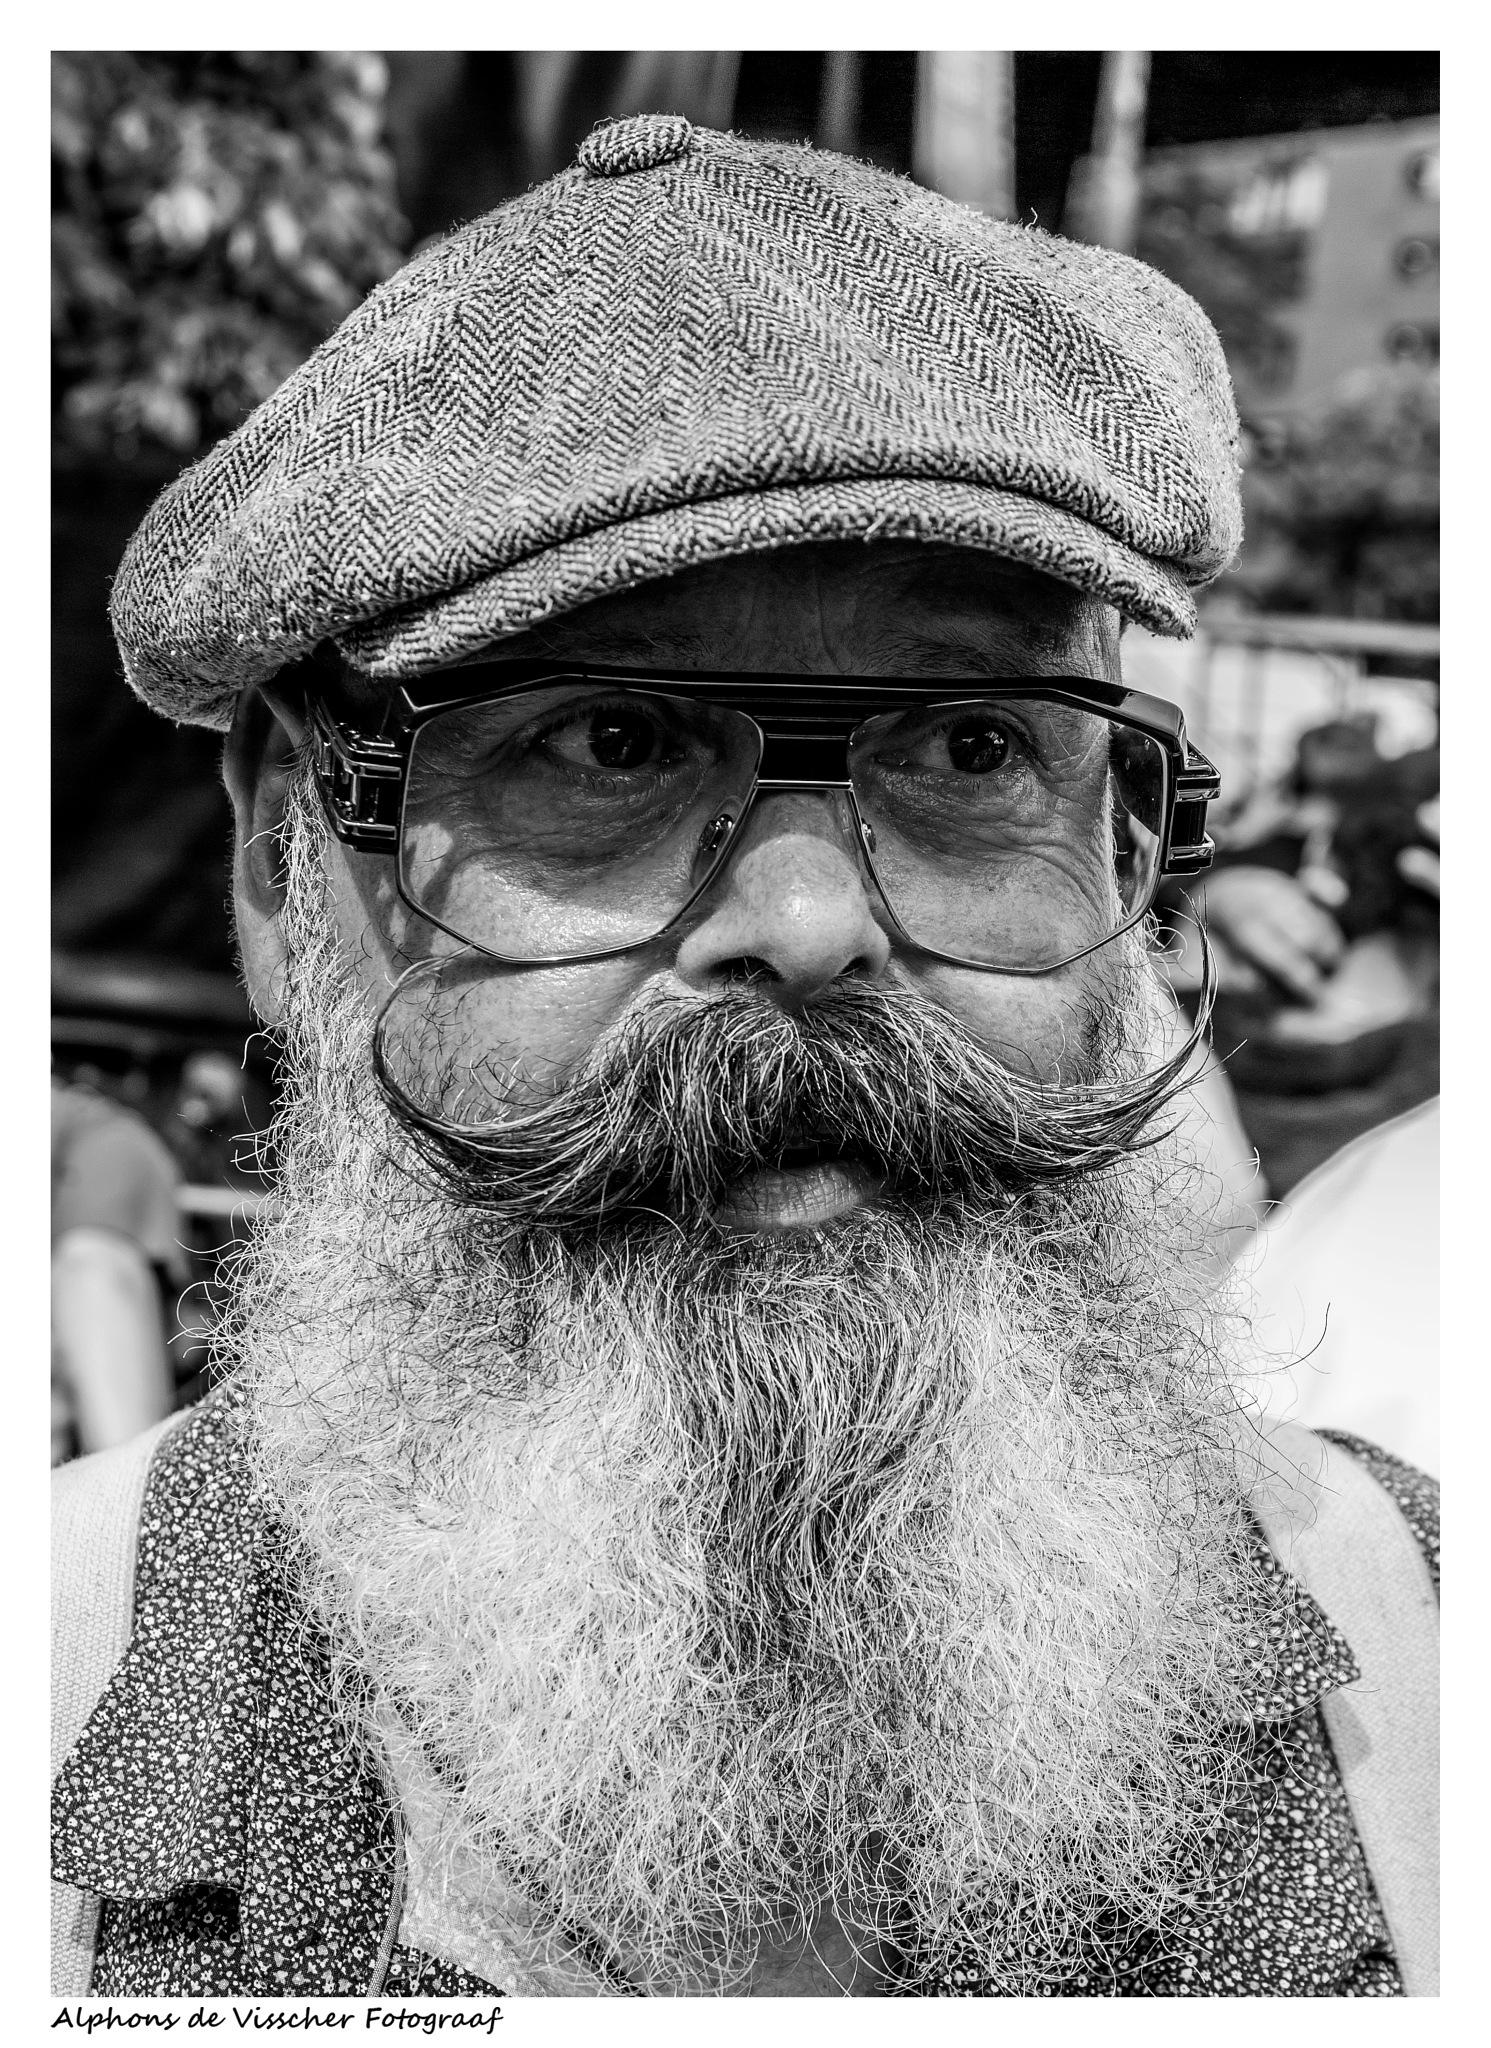 Male portrait by Alphons de Visscher Fotograaf